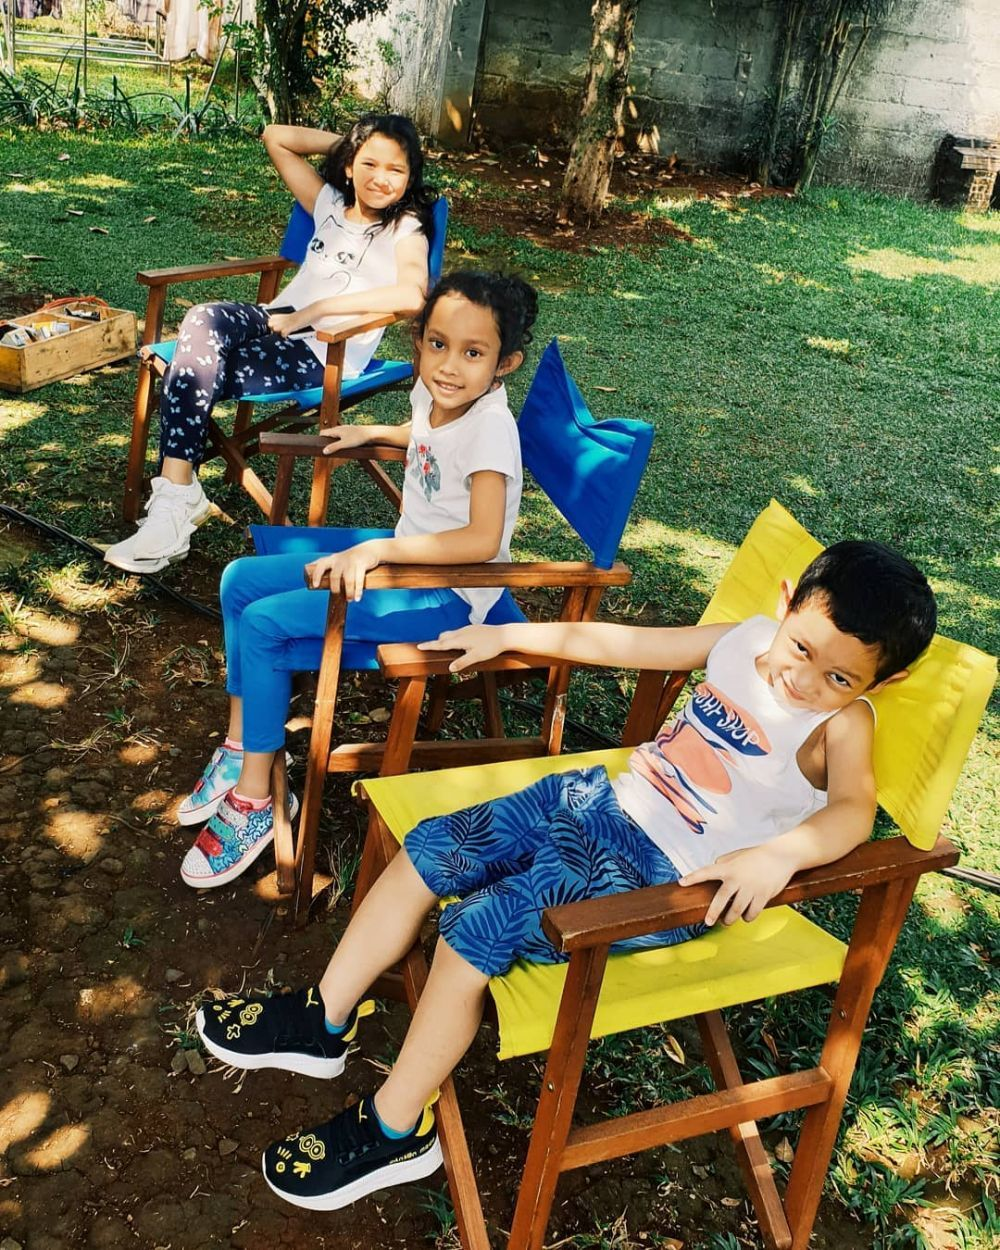 Akui Telah Mualaf, Ini 10 Potret Harmonis Keluarga Giovanni Tobing